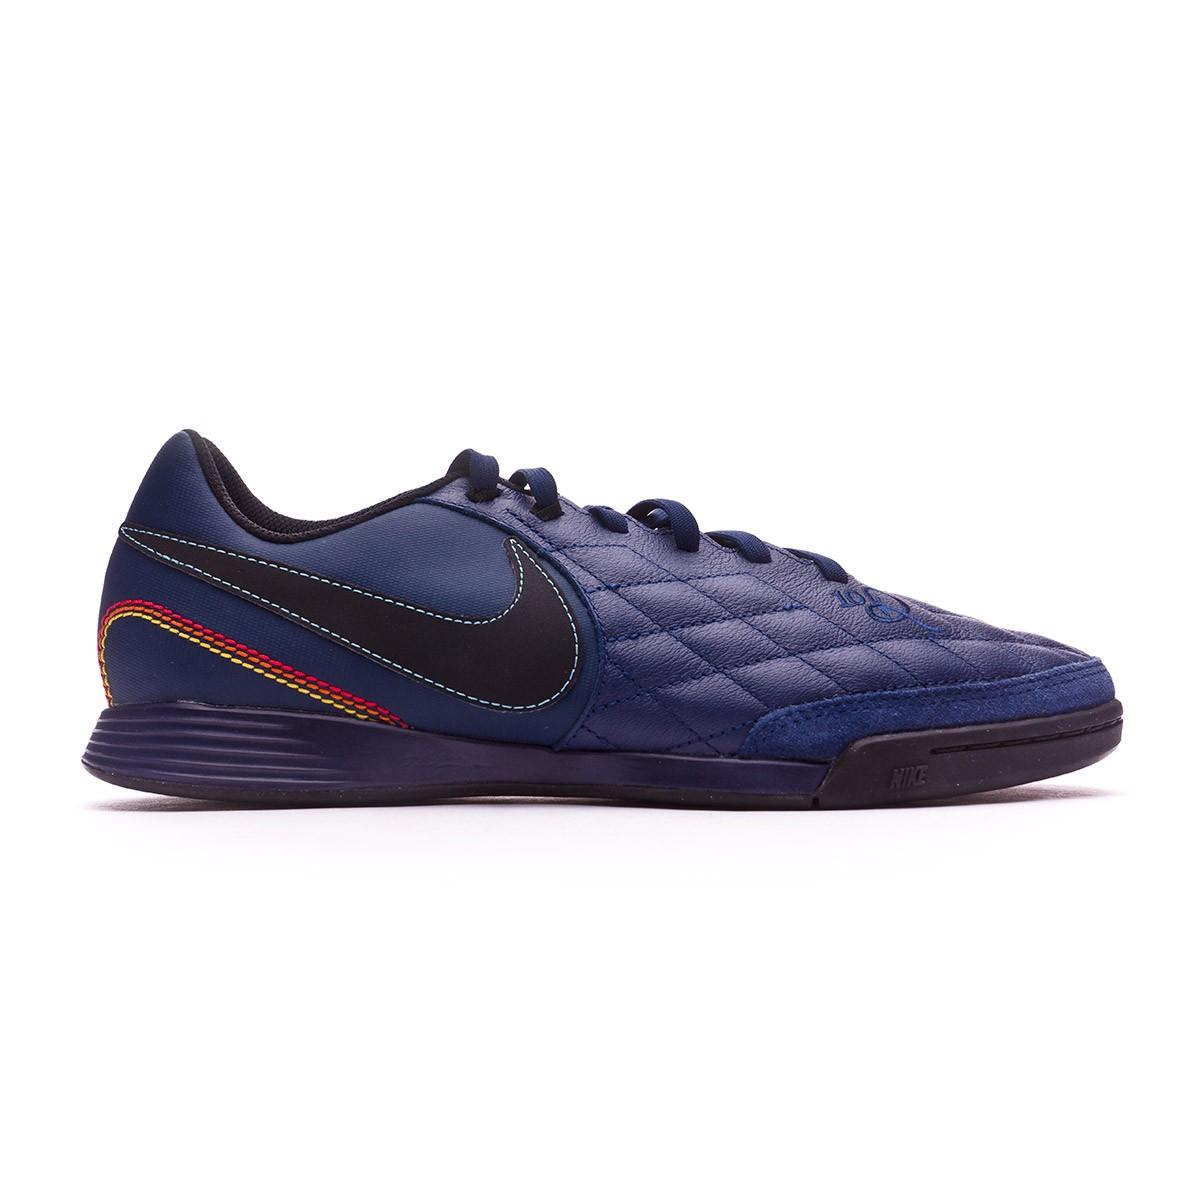 8445e2260 Futsal Boot Nike TiempoX Ligera IV 10R Porto Alegre IC Midnight navy-Black-Lagoon  pulse - Tienda de fútbol Fútbol Emotion